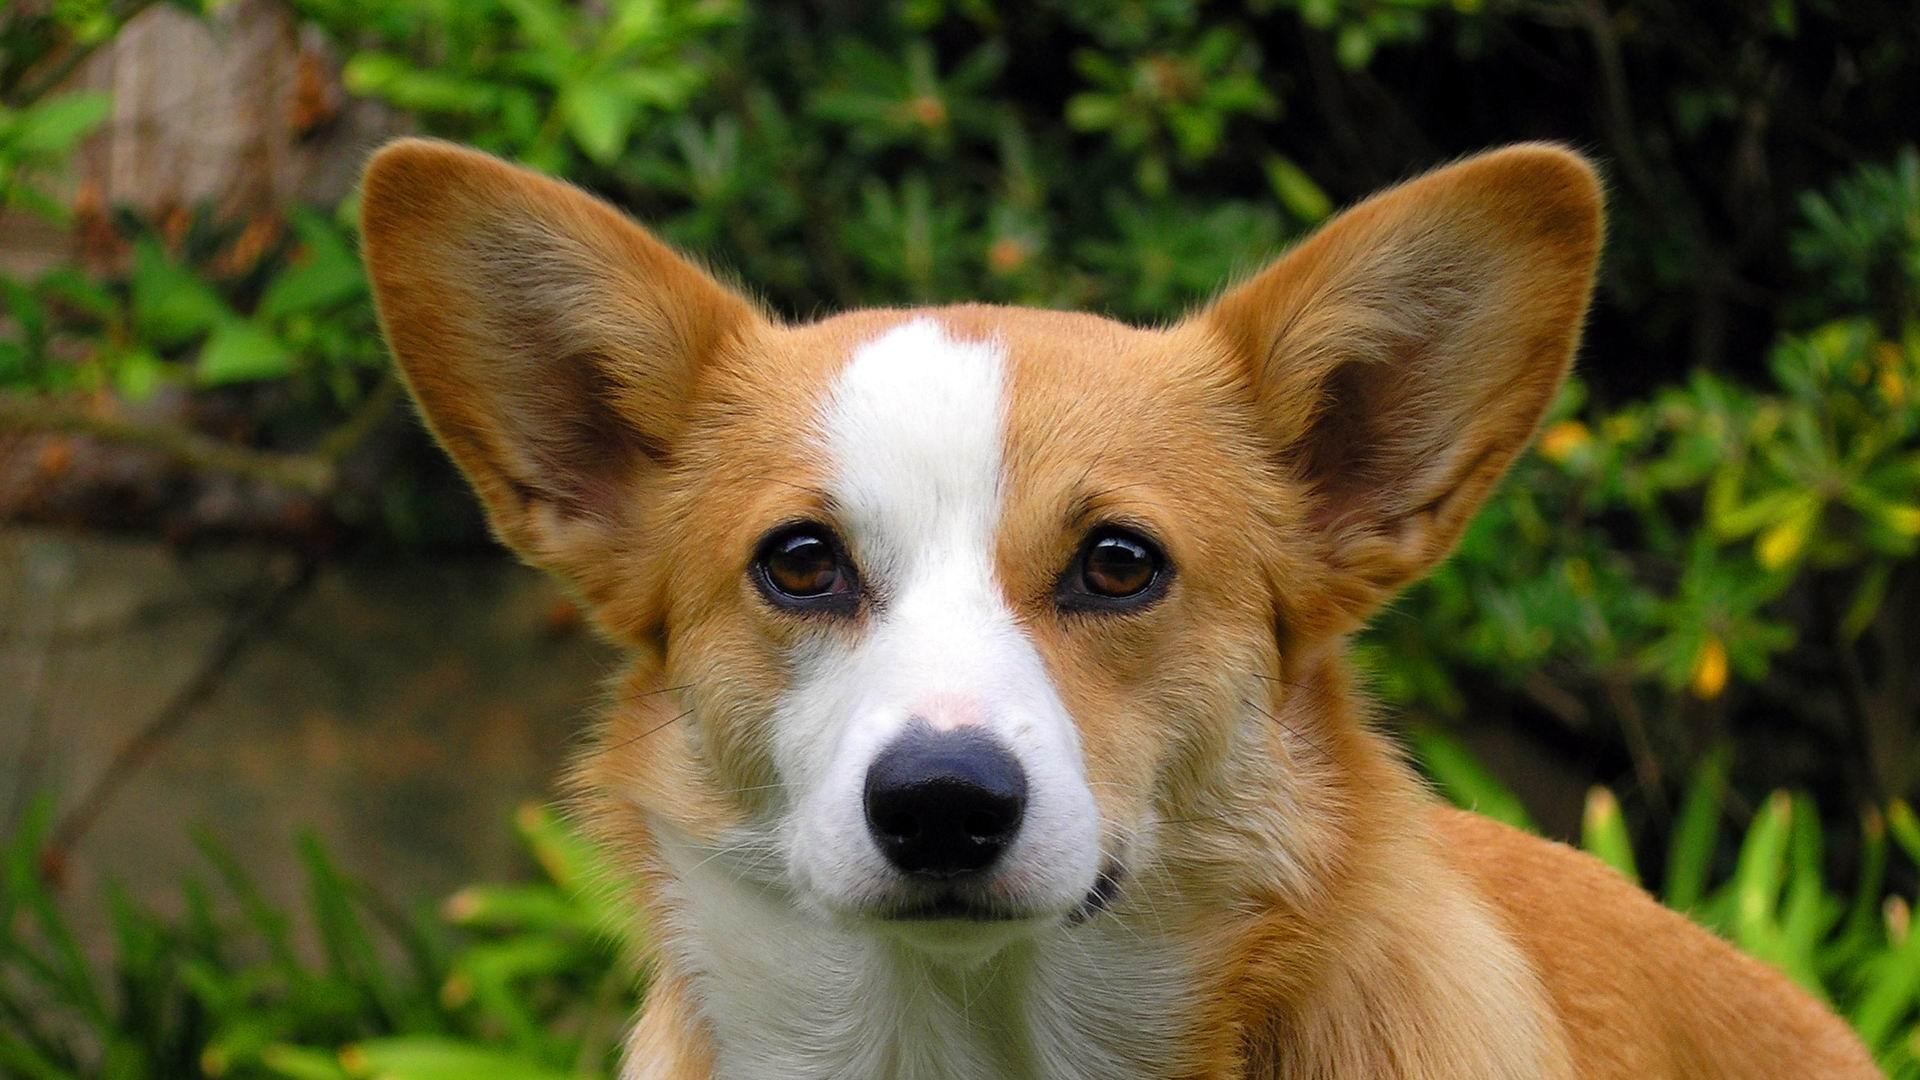 Cute Pet Dogs Corgi Photography HD Wallpaper 04 Preview